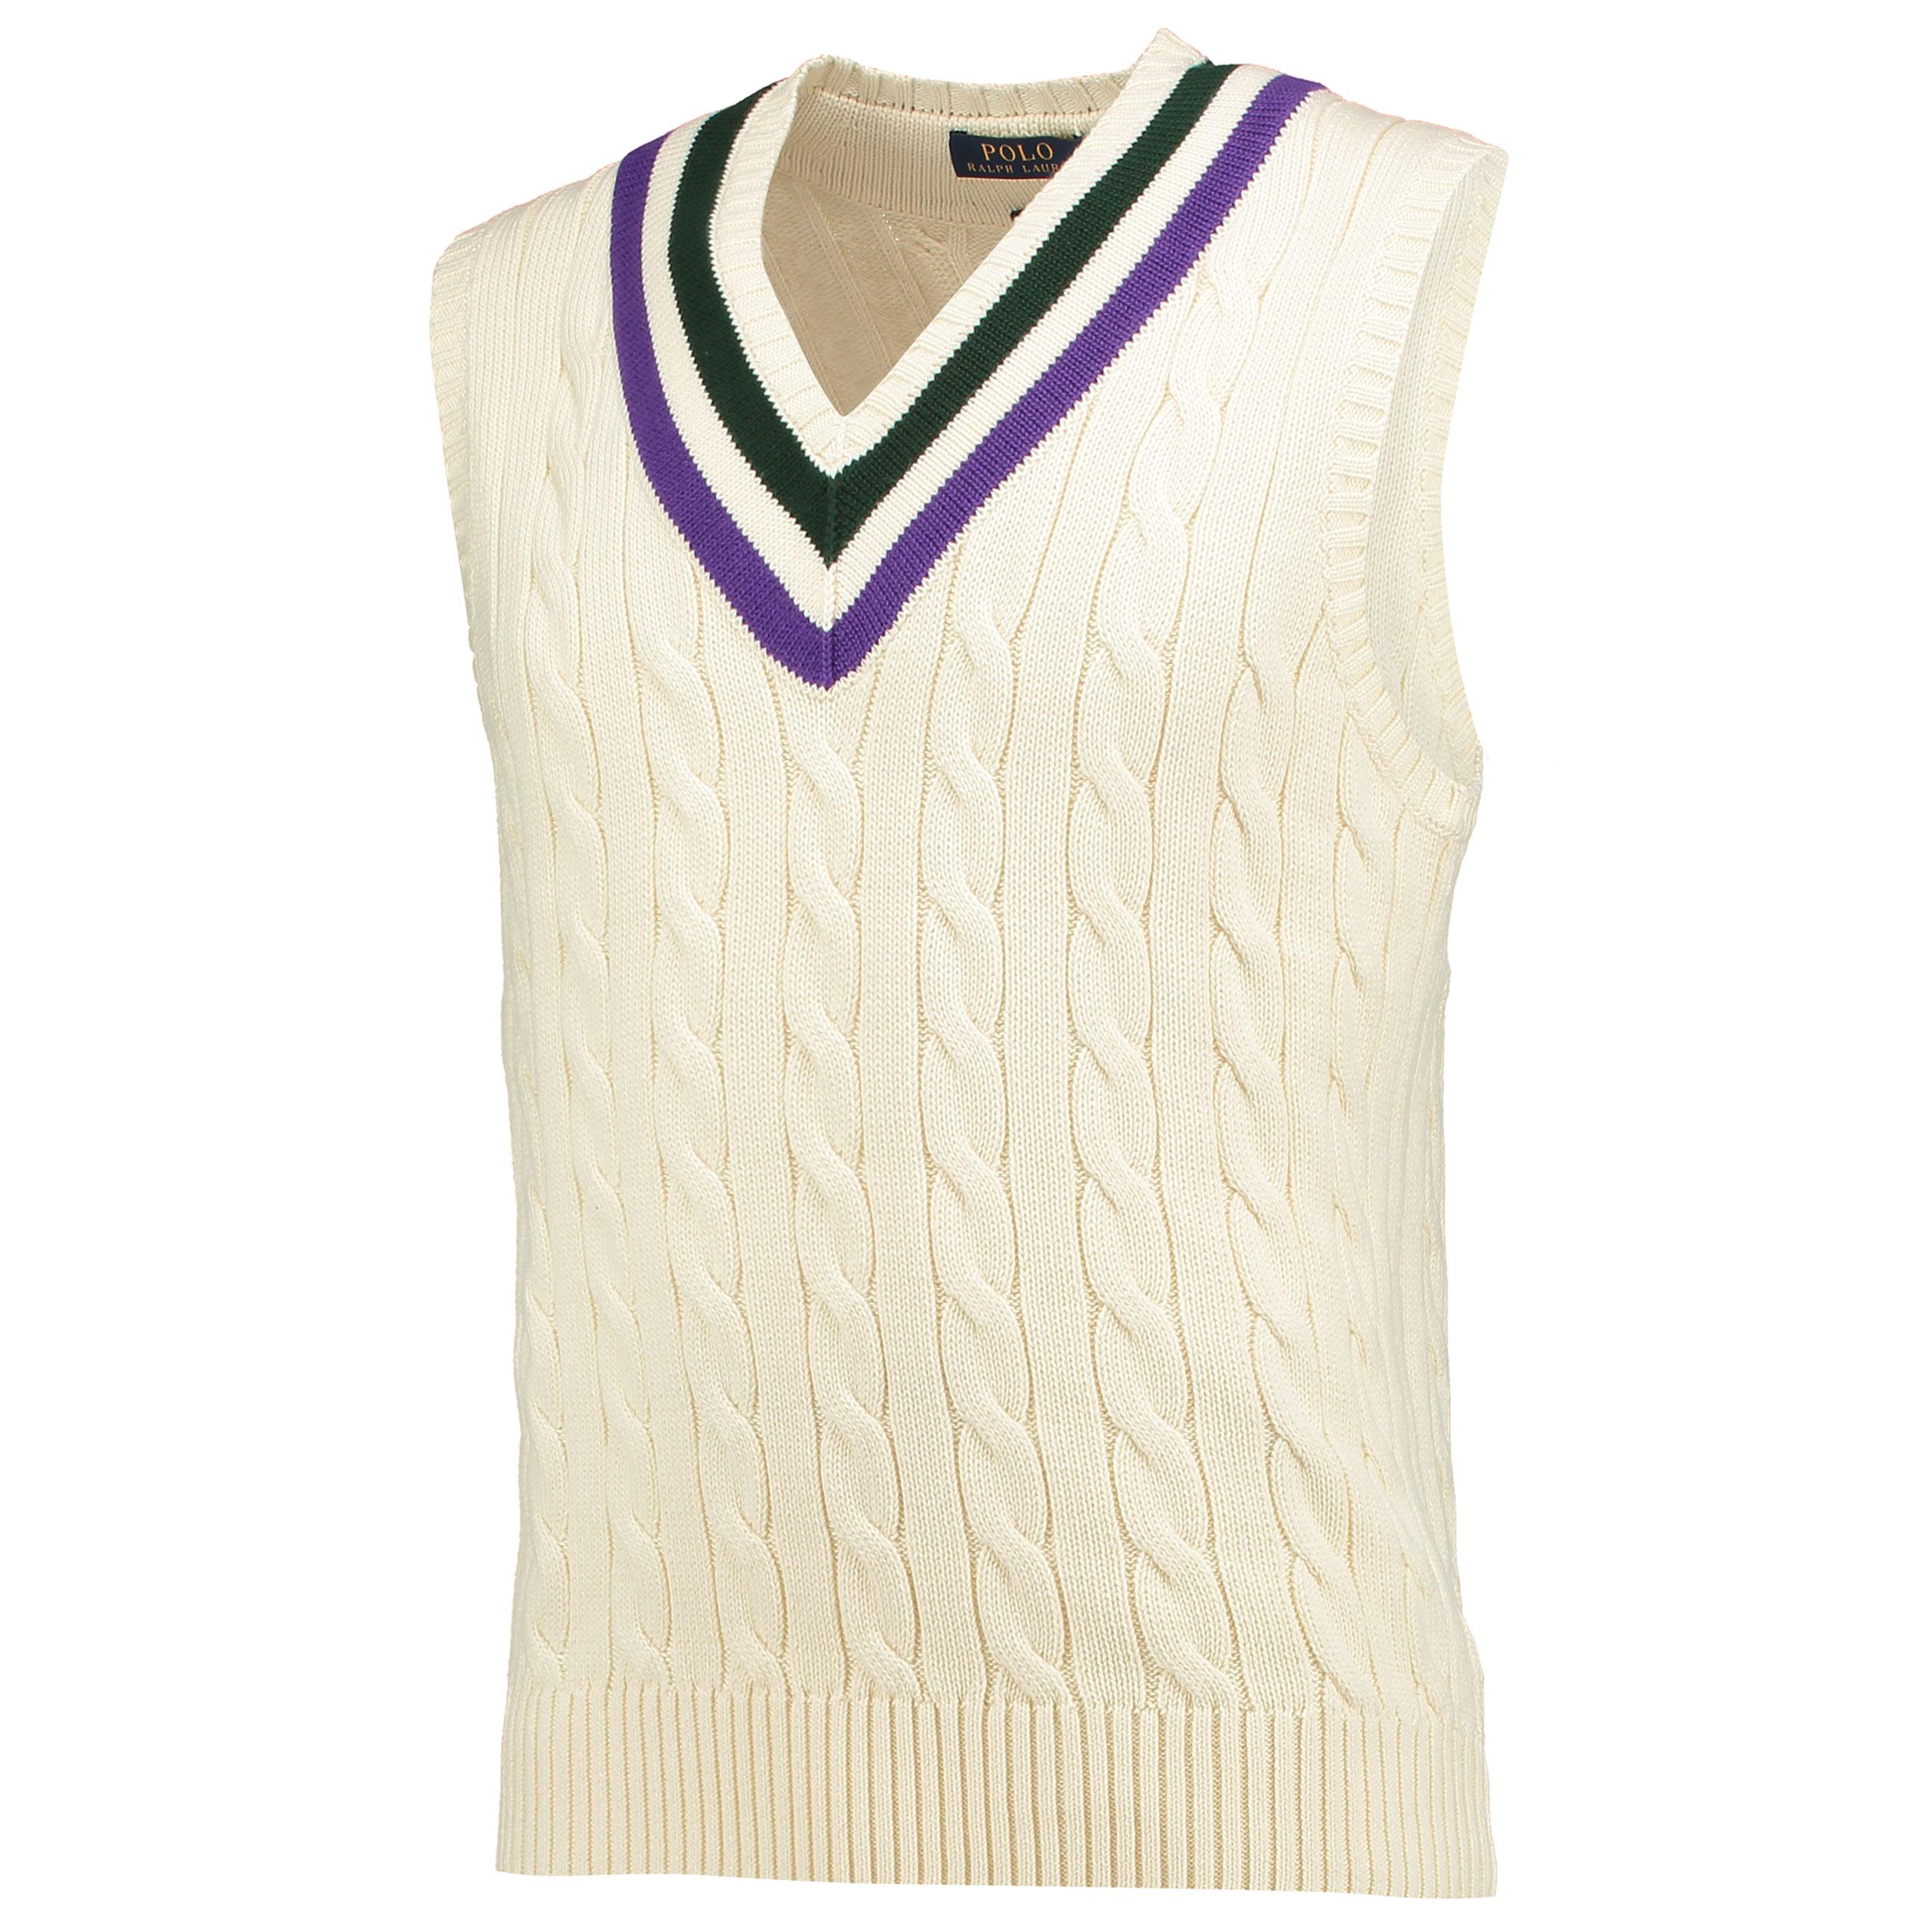 Wimbledon Ralph Lauren Tennis Vest - Cricket Cream